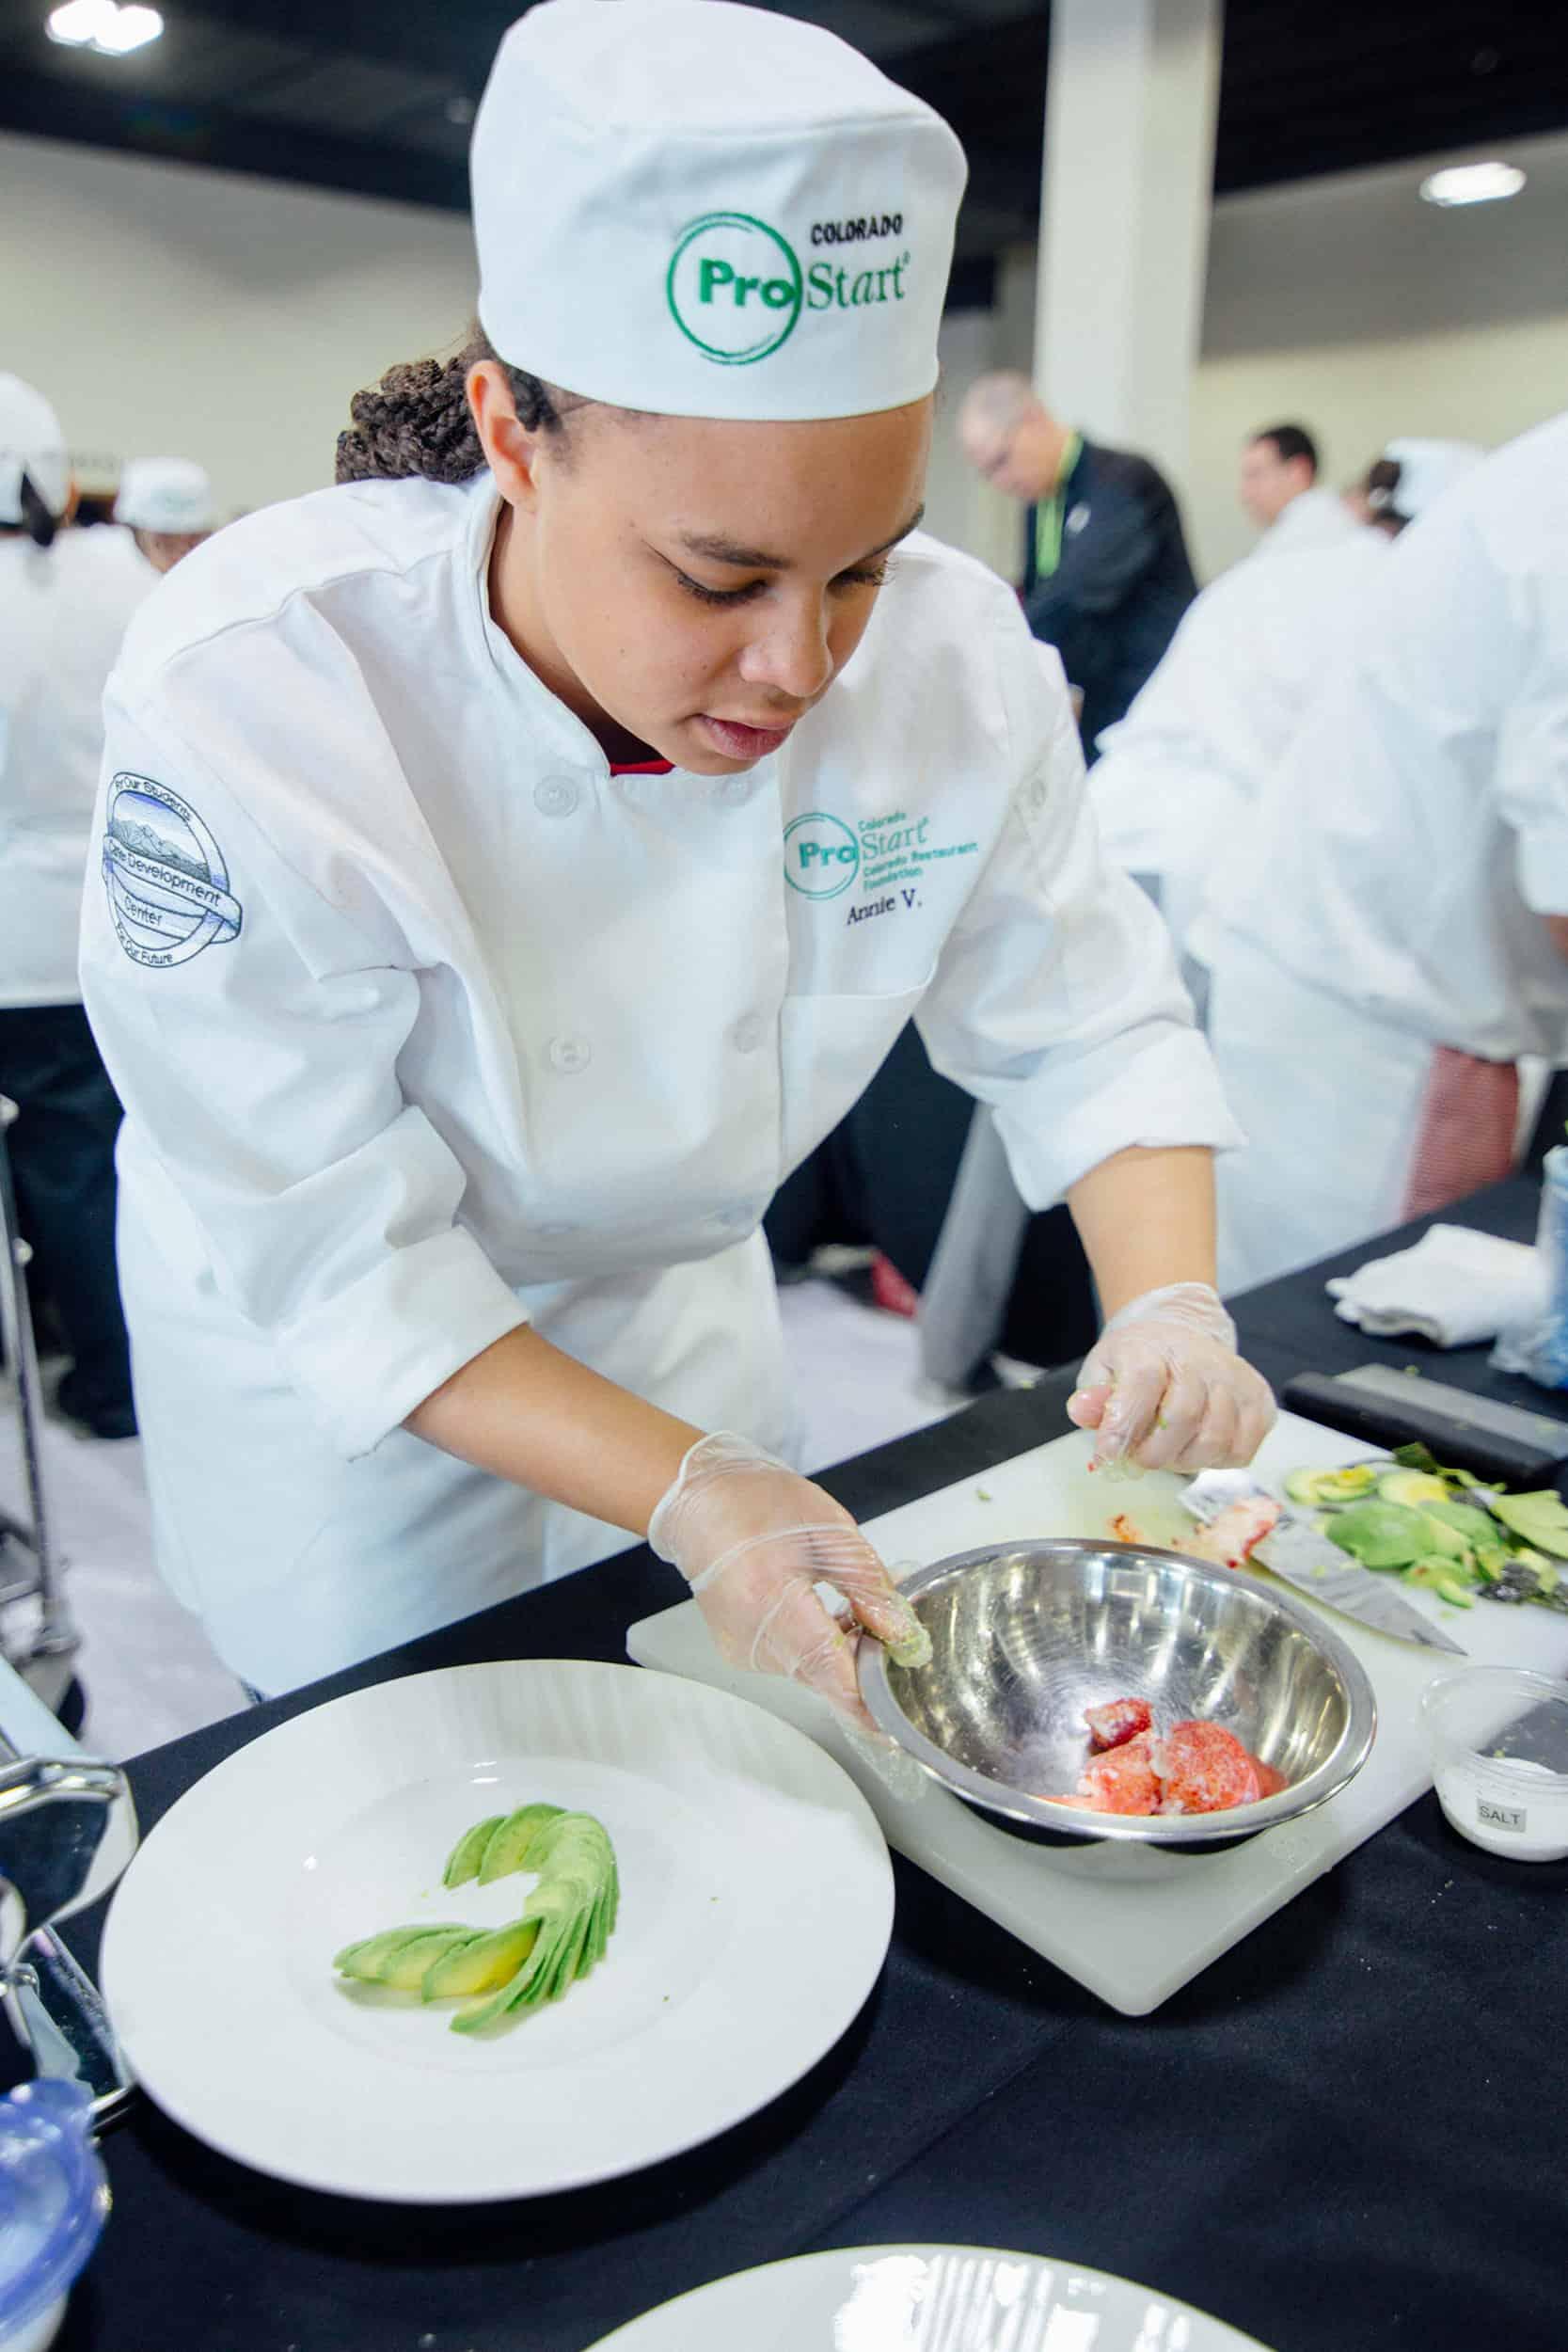 CDC culinary student prepares an avocado salad